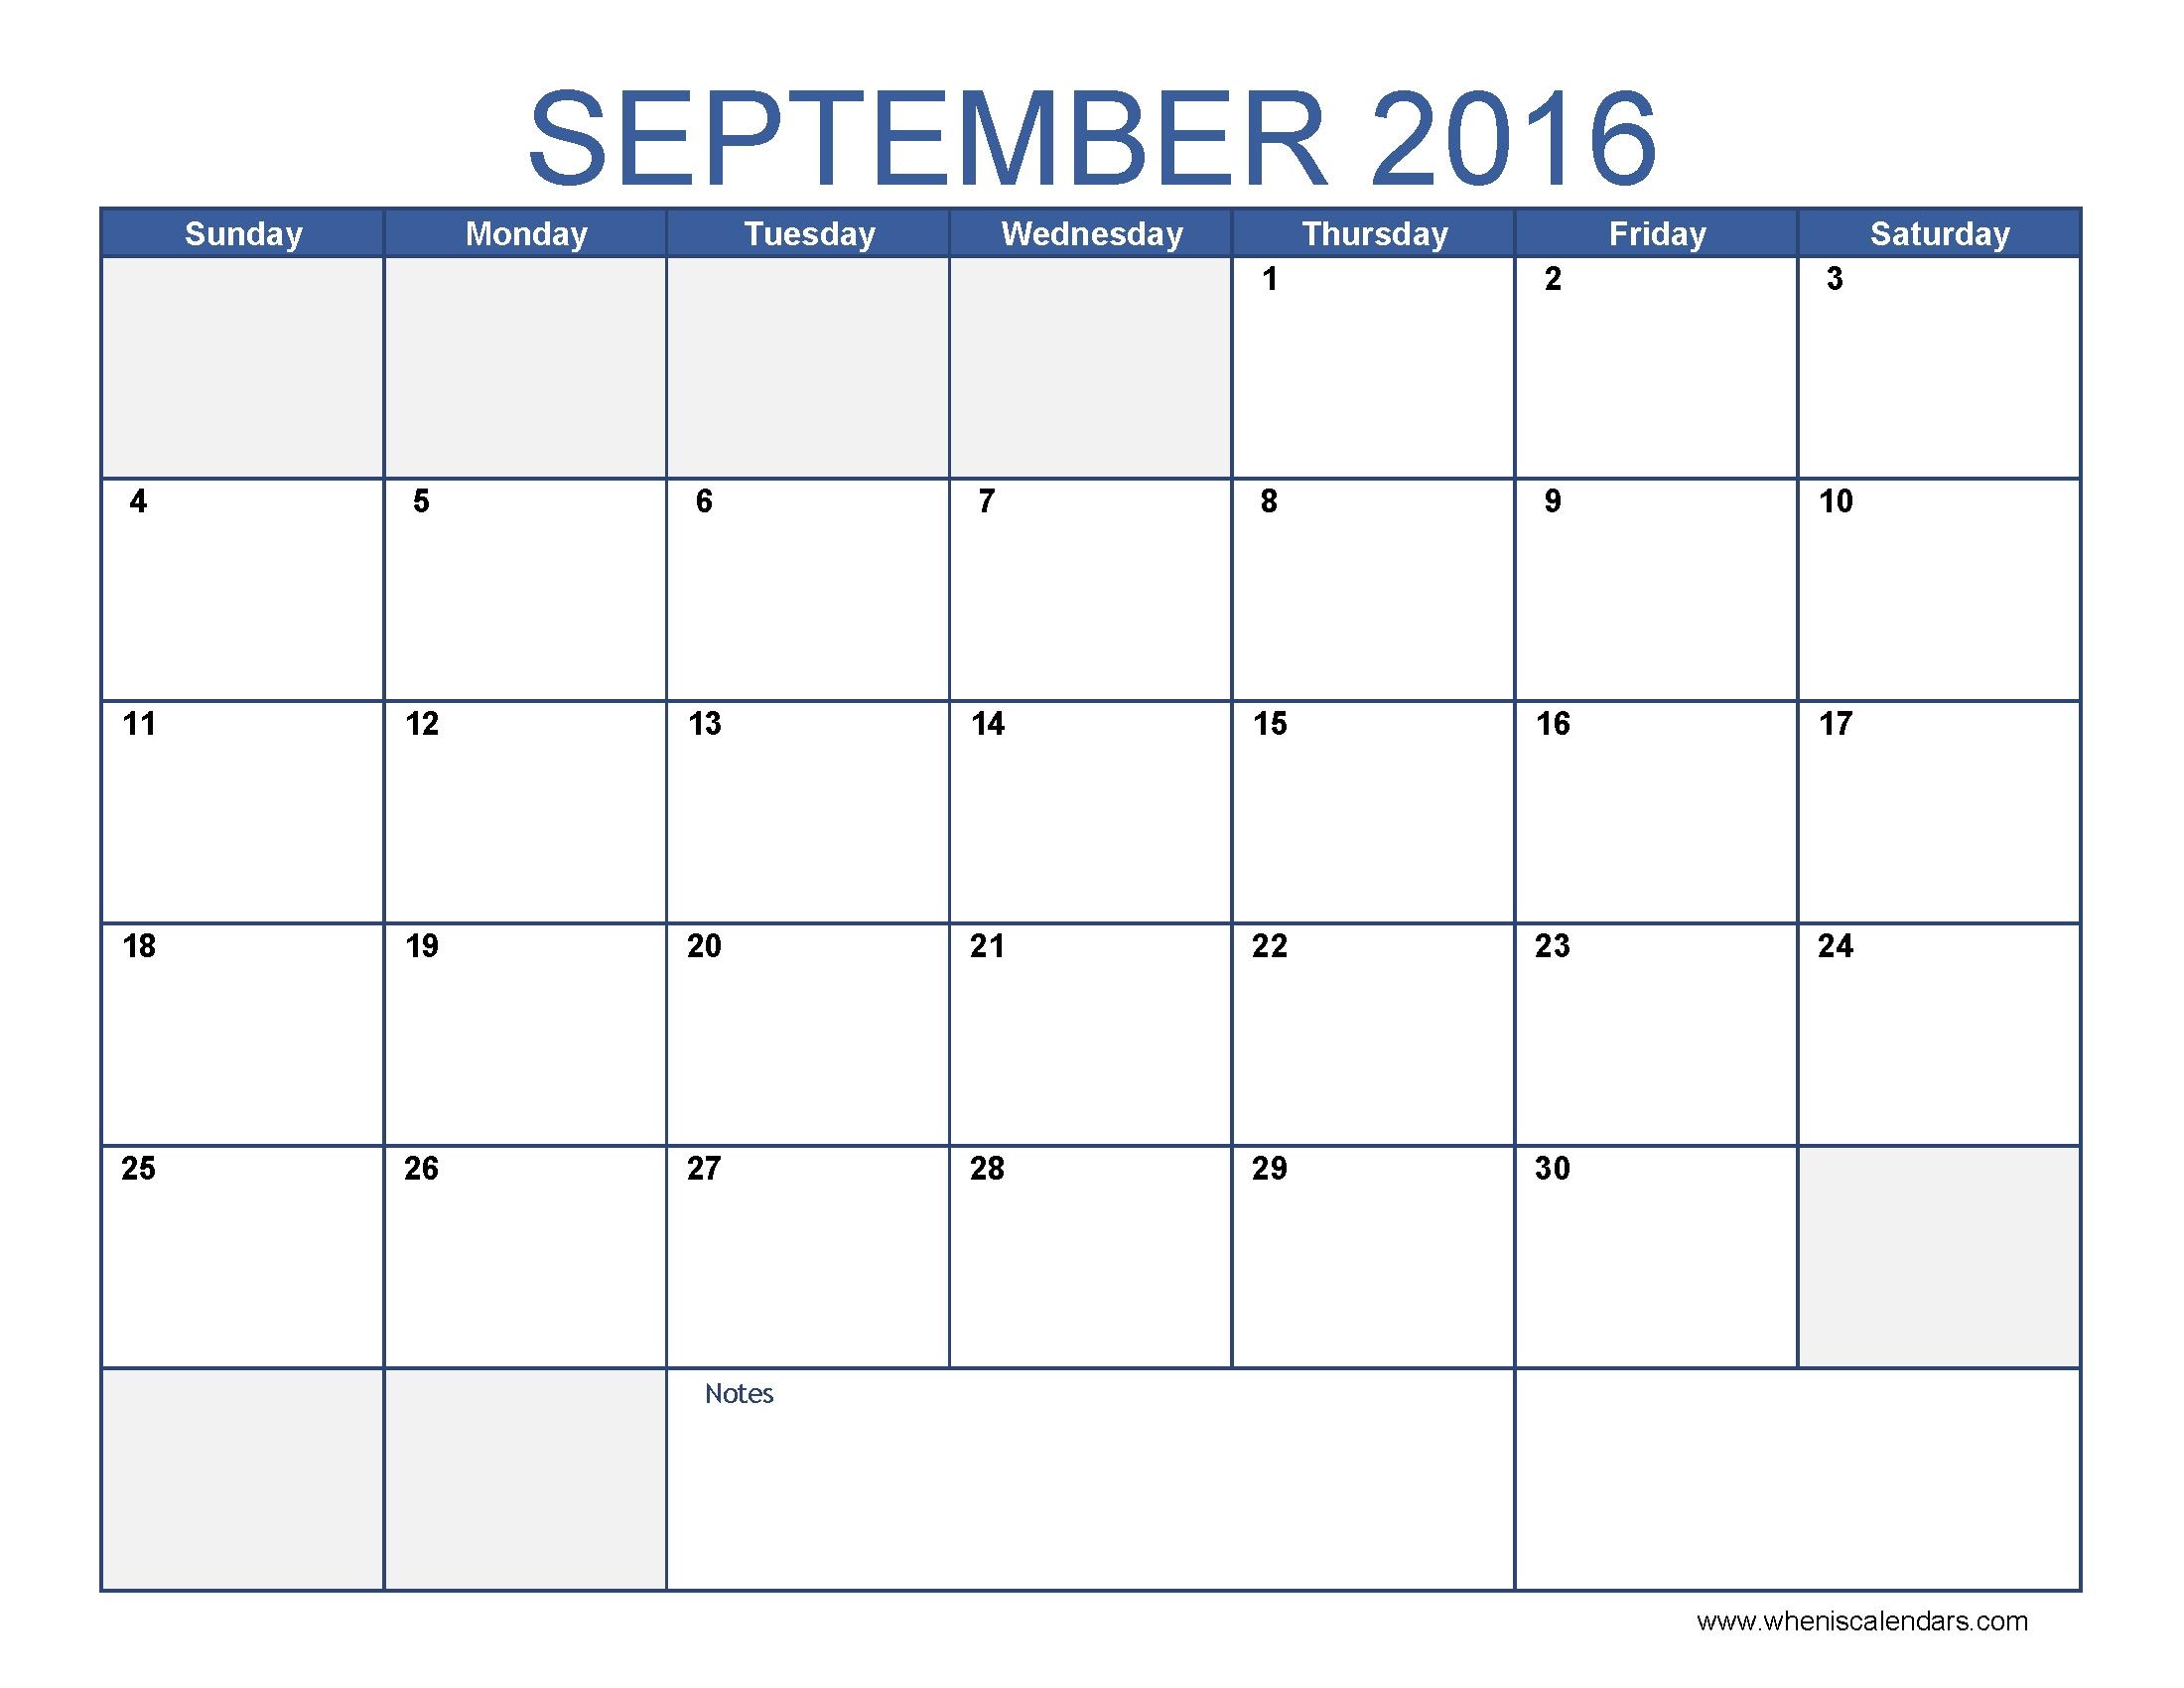 September 2016 Calendar Excel #september2016 #excelcalendar throughout Calendar Of The Month Of September